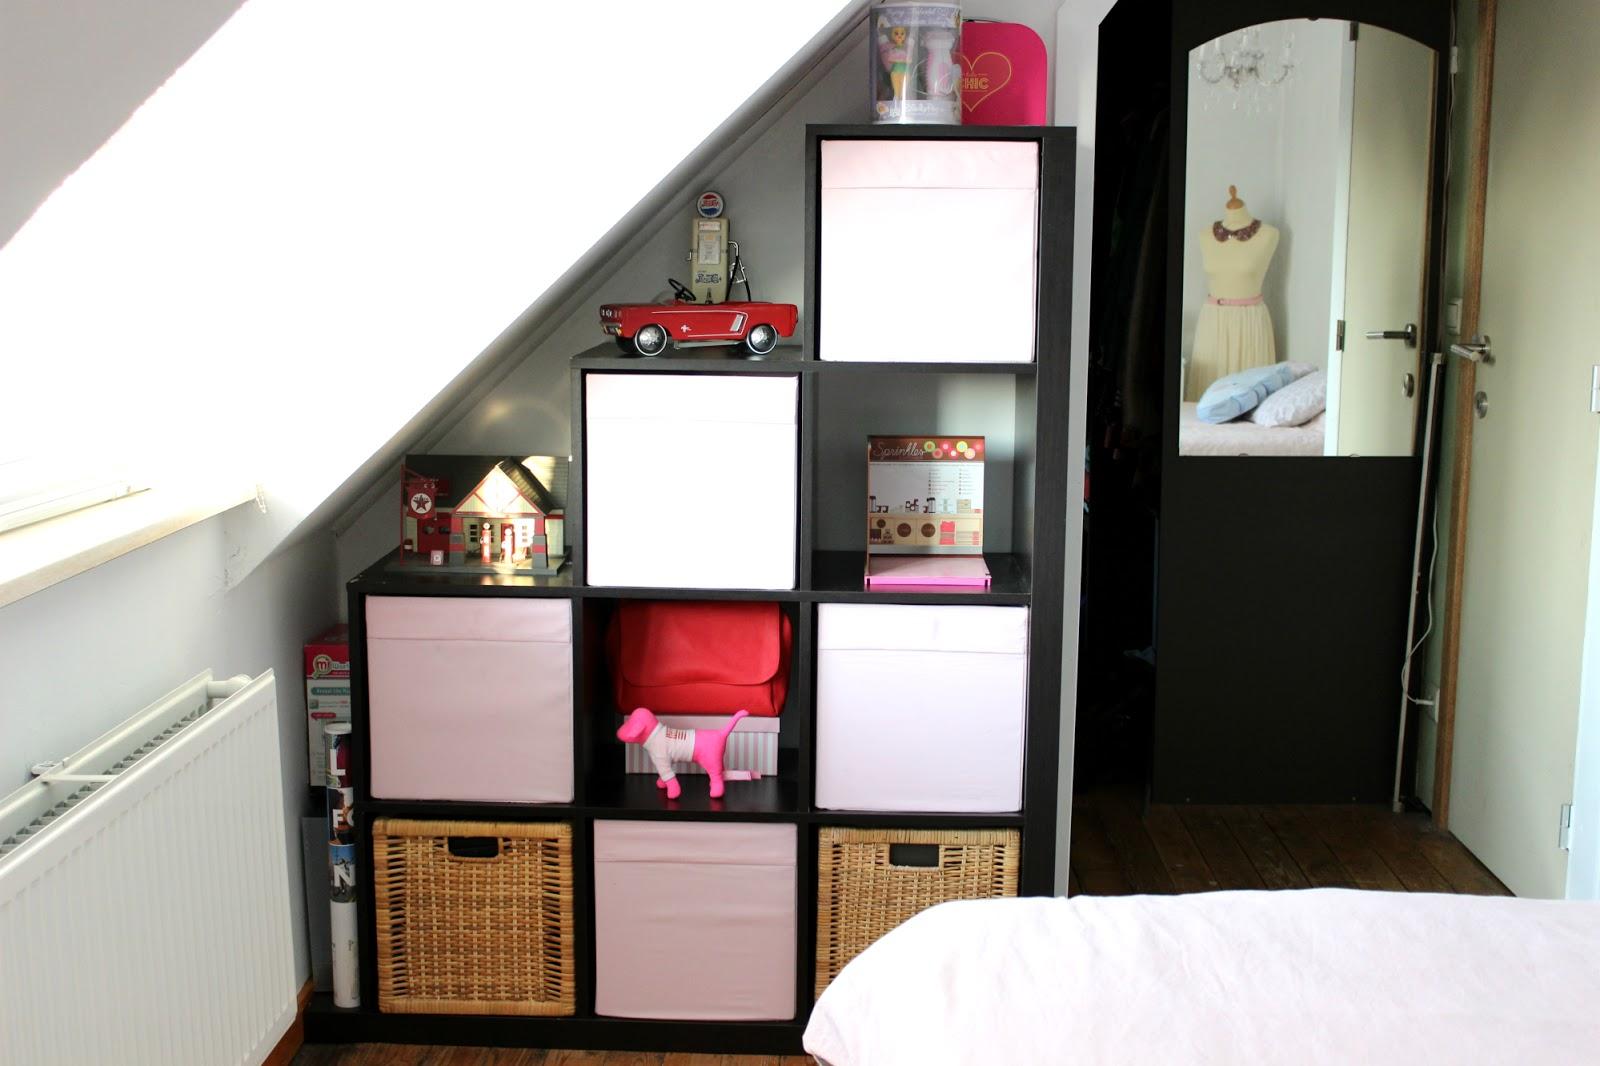 Grote Ikea Inloopkast : Inloopkast ikea stolmen cool excellent perfect dcoration meuble